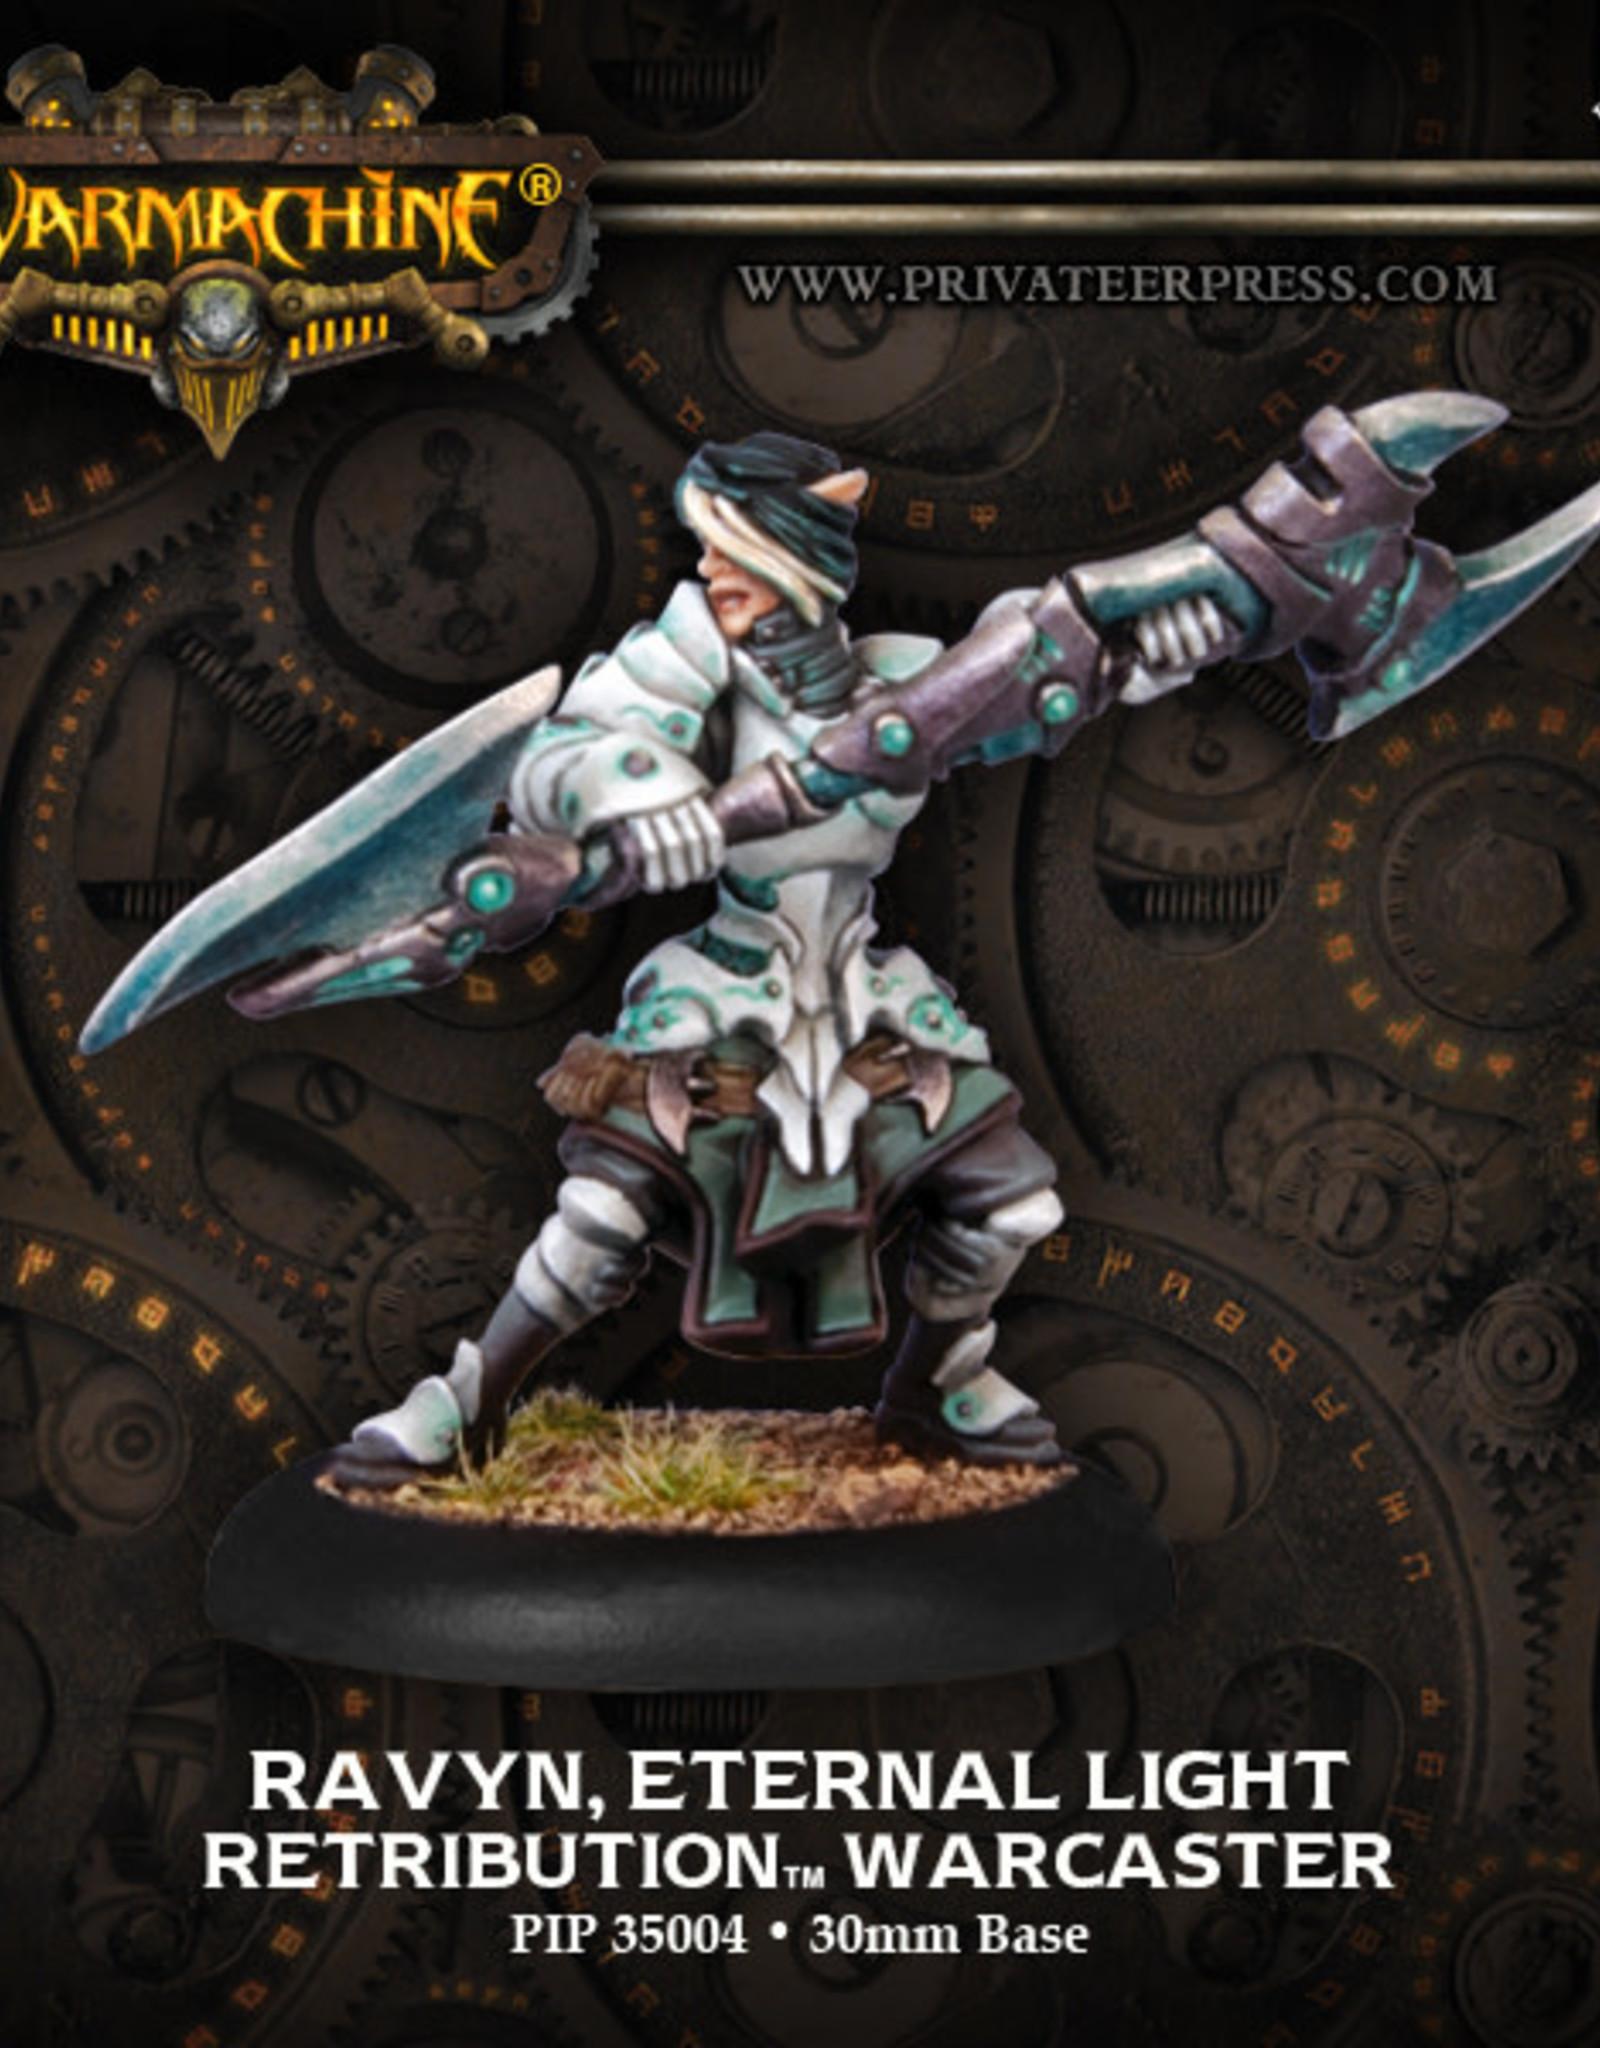 Warmachine Scyrah - Ravyn Eternal Light